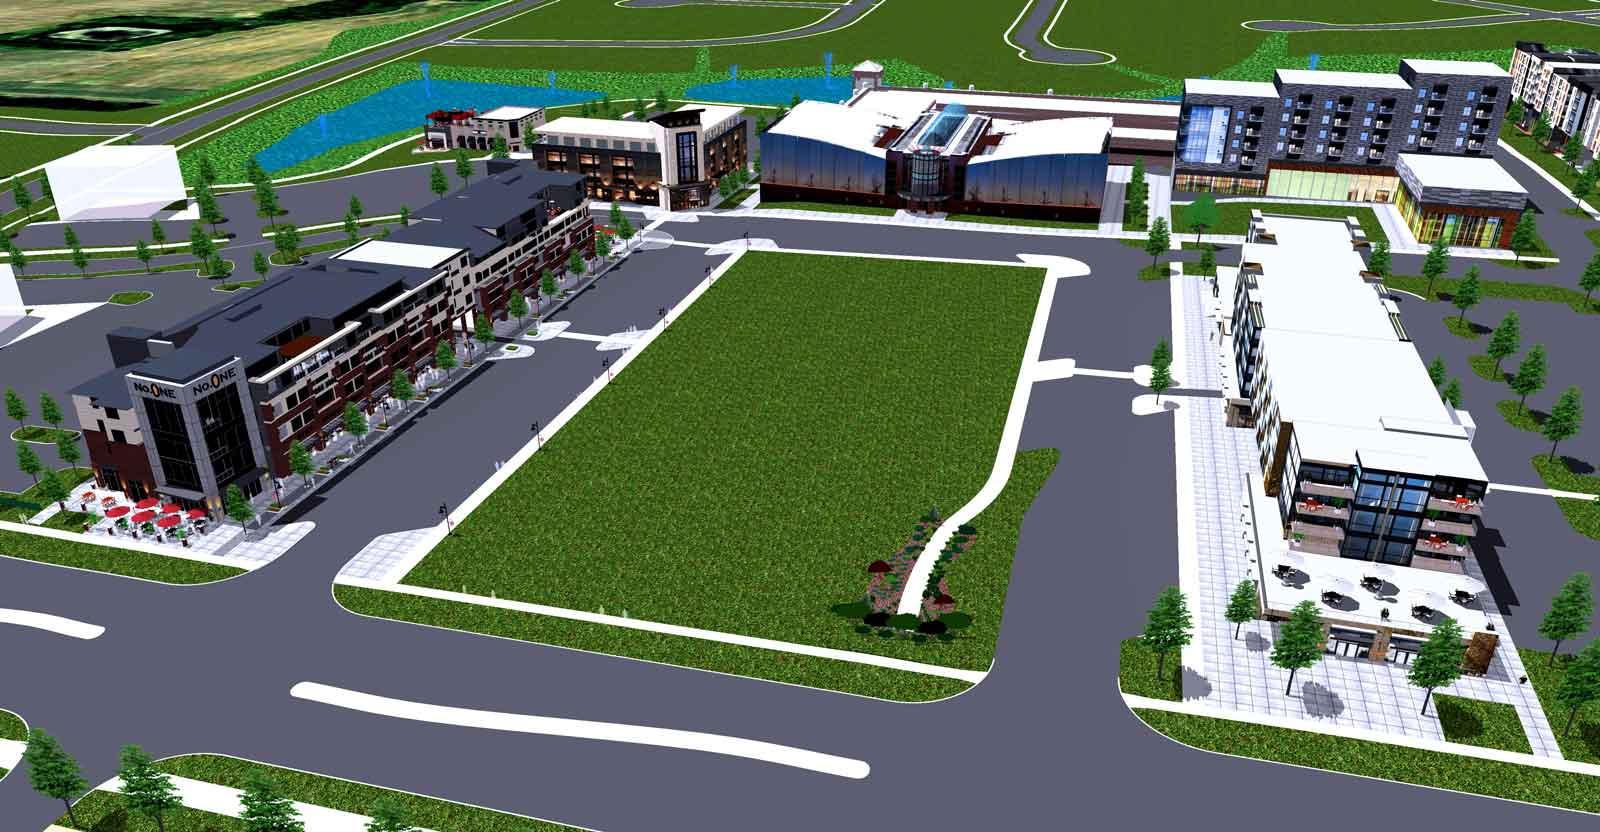 parkplace-rendering